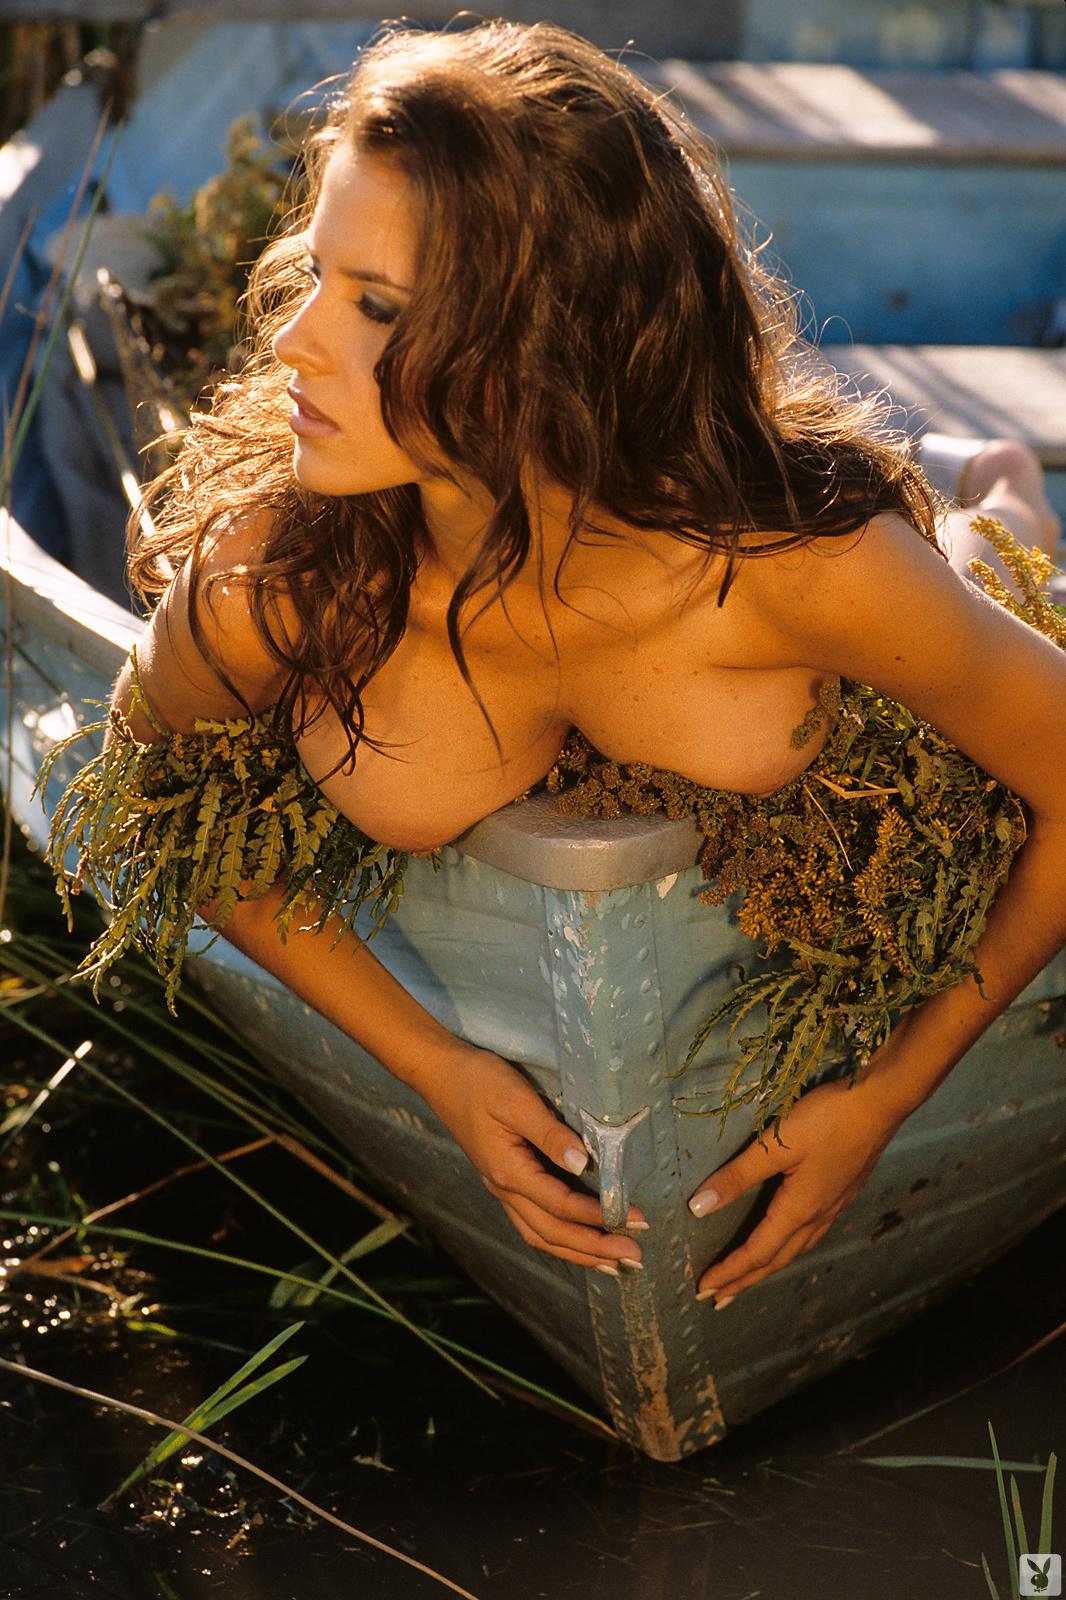 kelly-monaco-boobs-naked-playmate-april-1997-playboy-11